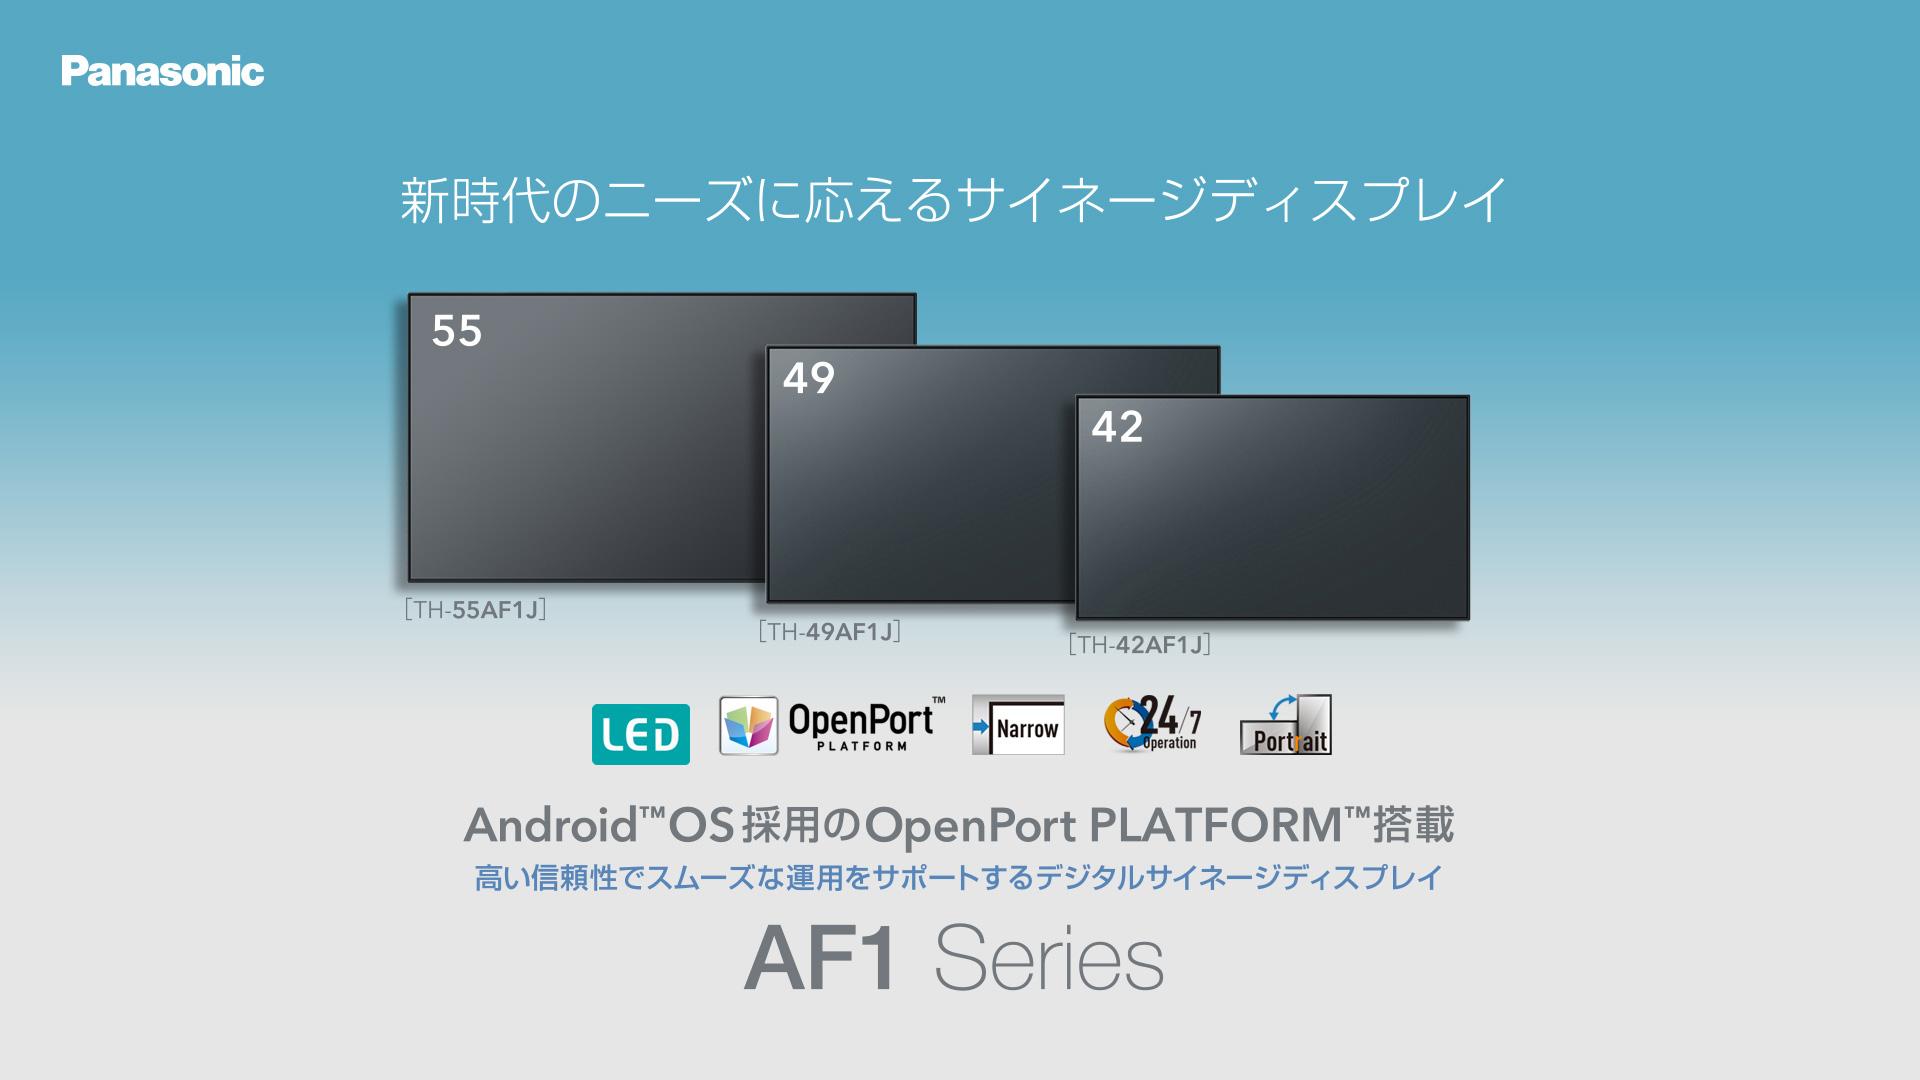 AF1 series